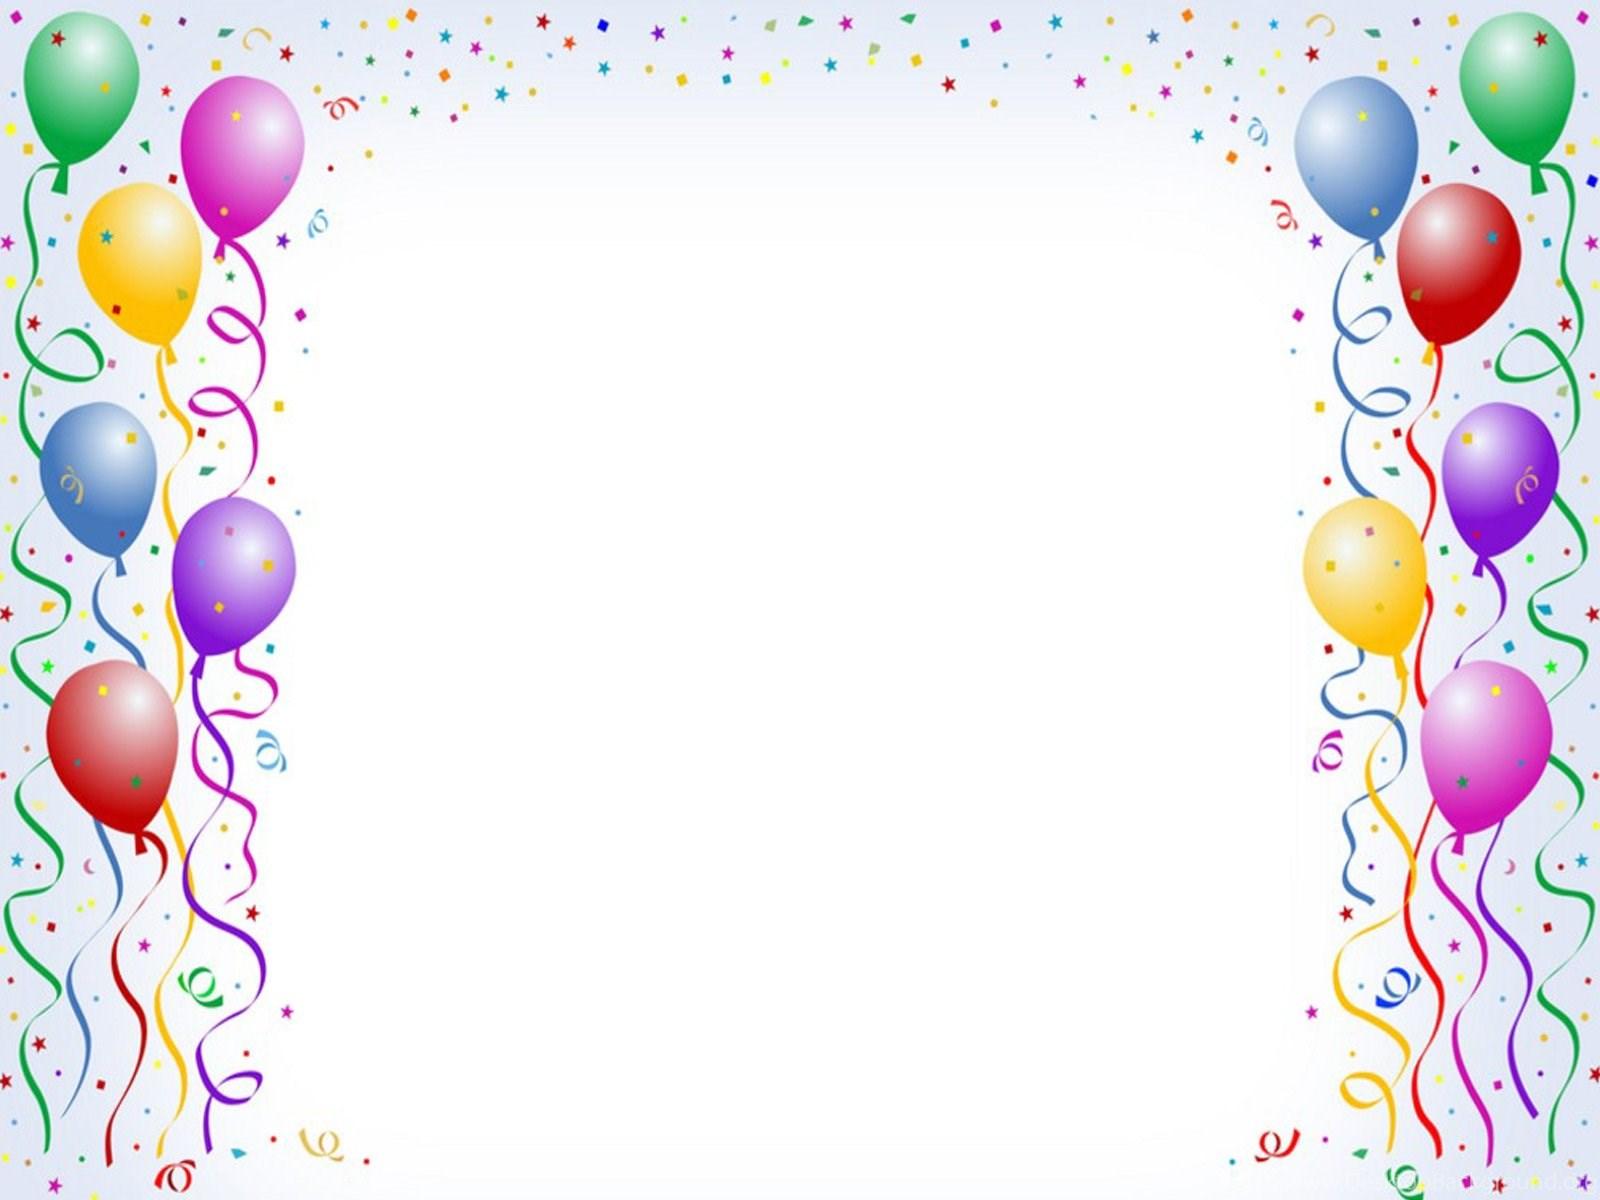 Free Birthday Backgrounds Wallpapers Desktop Background